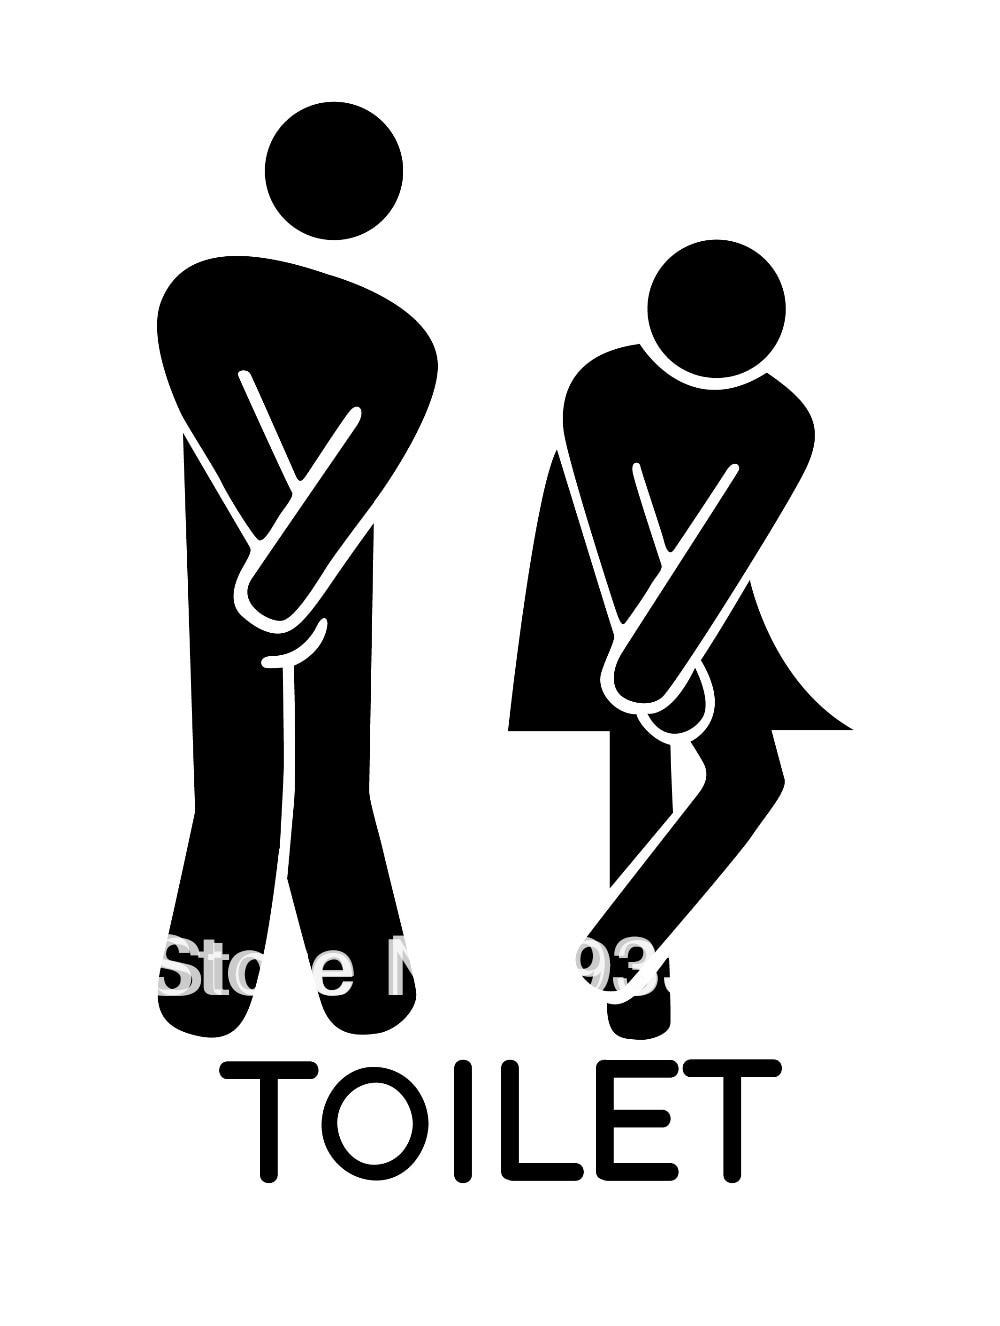 DIY Funny Toilet Fashion bathroom logo 1 Pattern PVC glass or ...